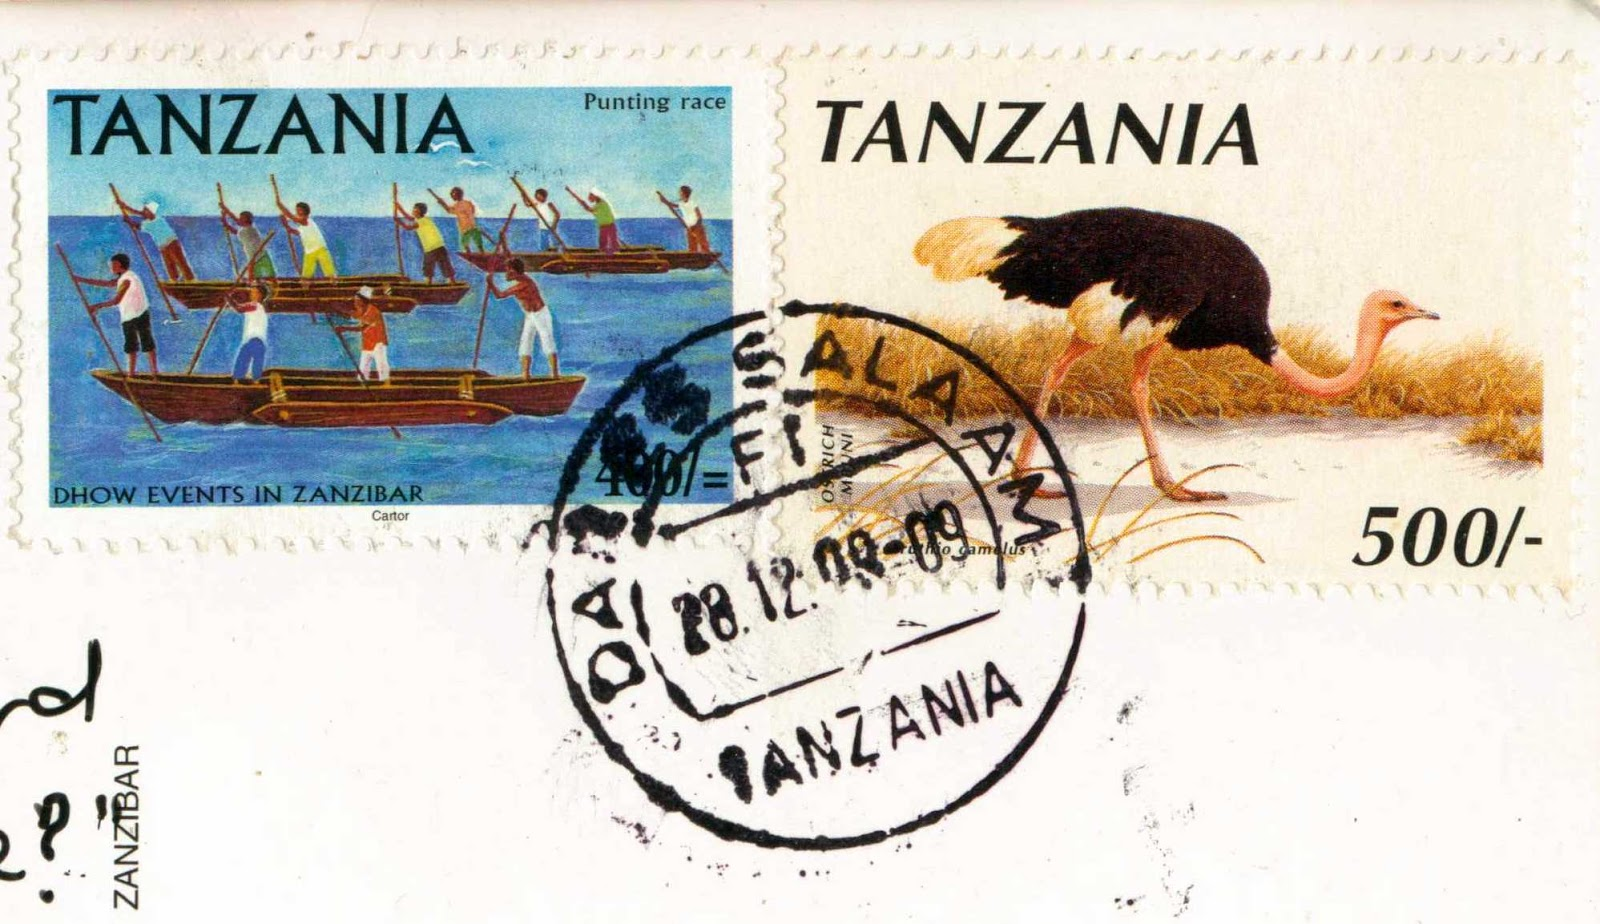 tanzania_stamp_postcard_ostrich_dhow_races_zanzibar-1487812947.jpg